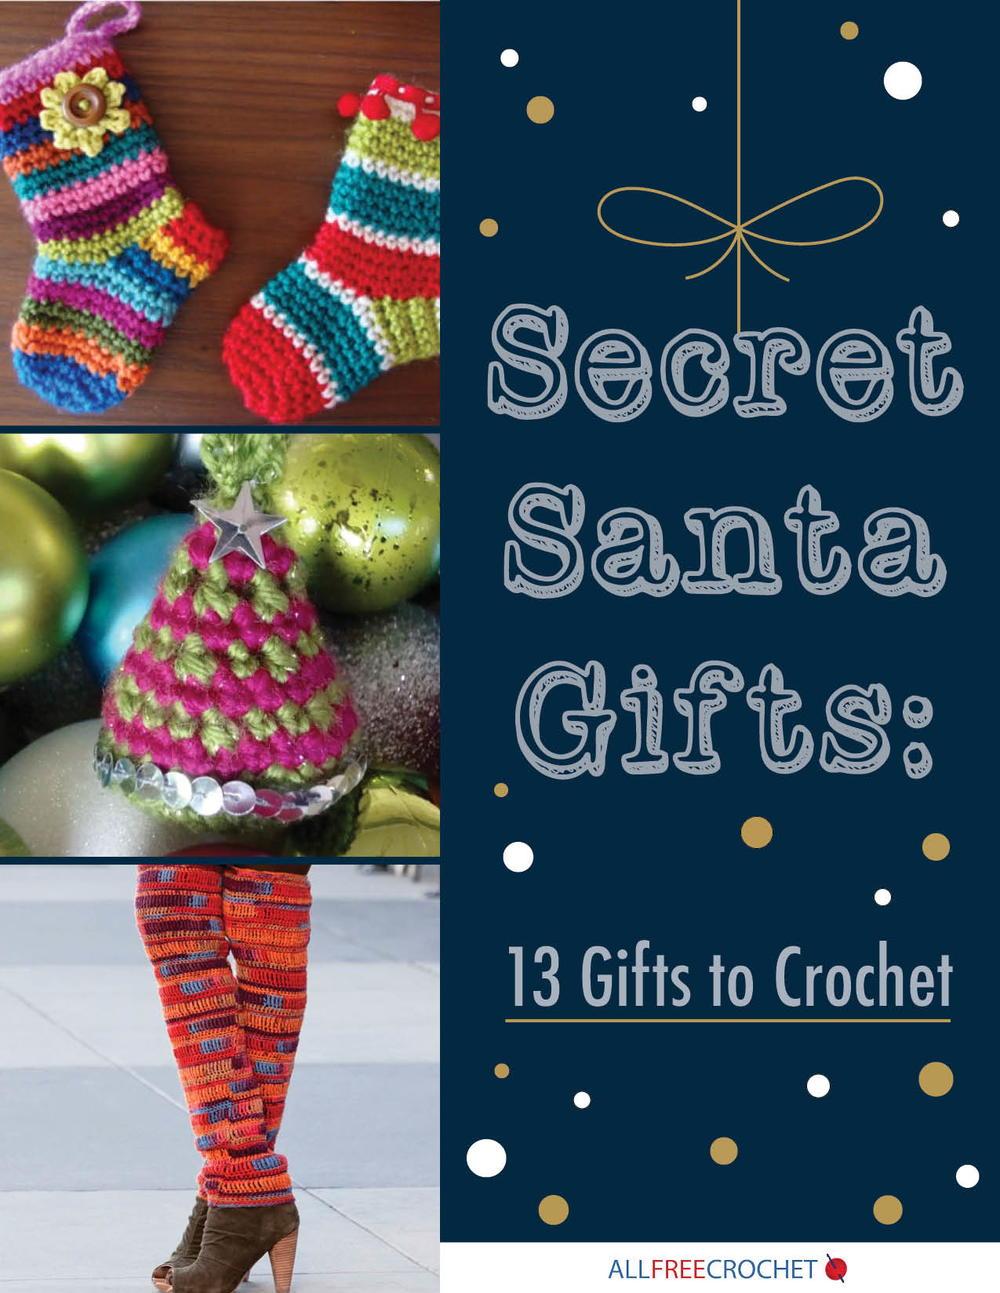 Secret Santa Gifts  13 Gifts to Crochet  86f2bd2d43b7